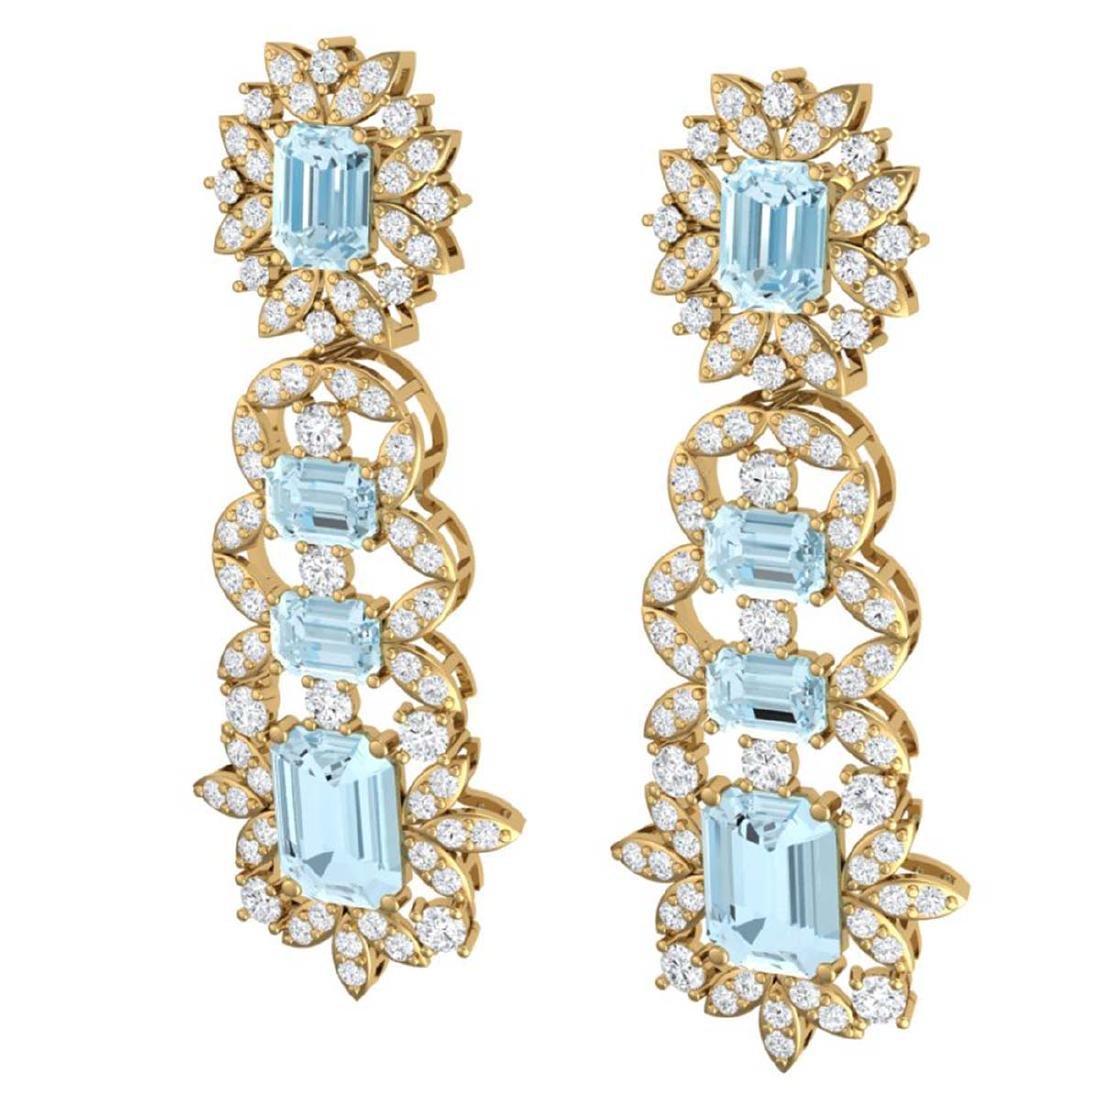 33.36 ctw Sky Topaz & VS Diamond Earrings 18K Yellow - 2